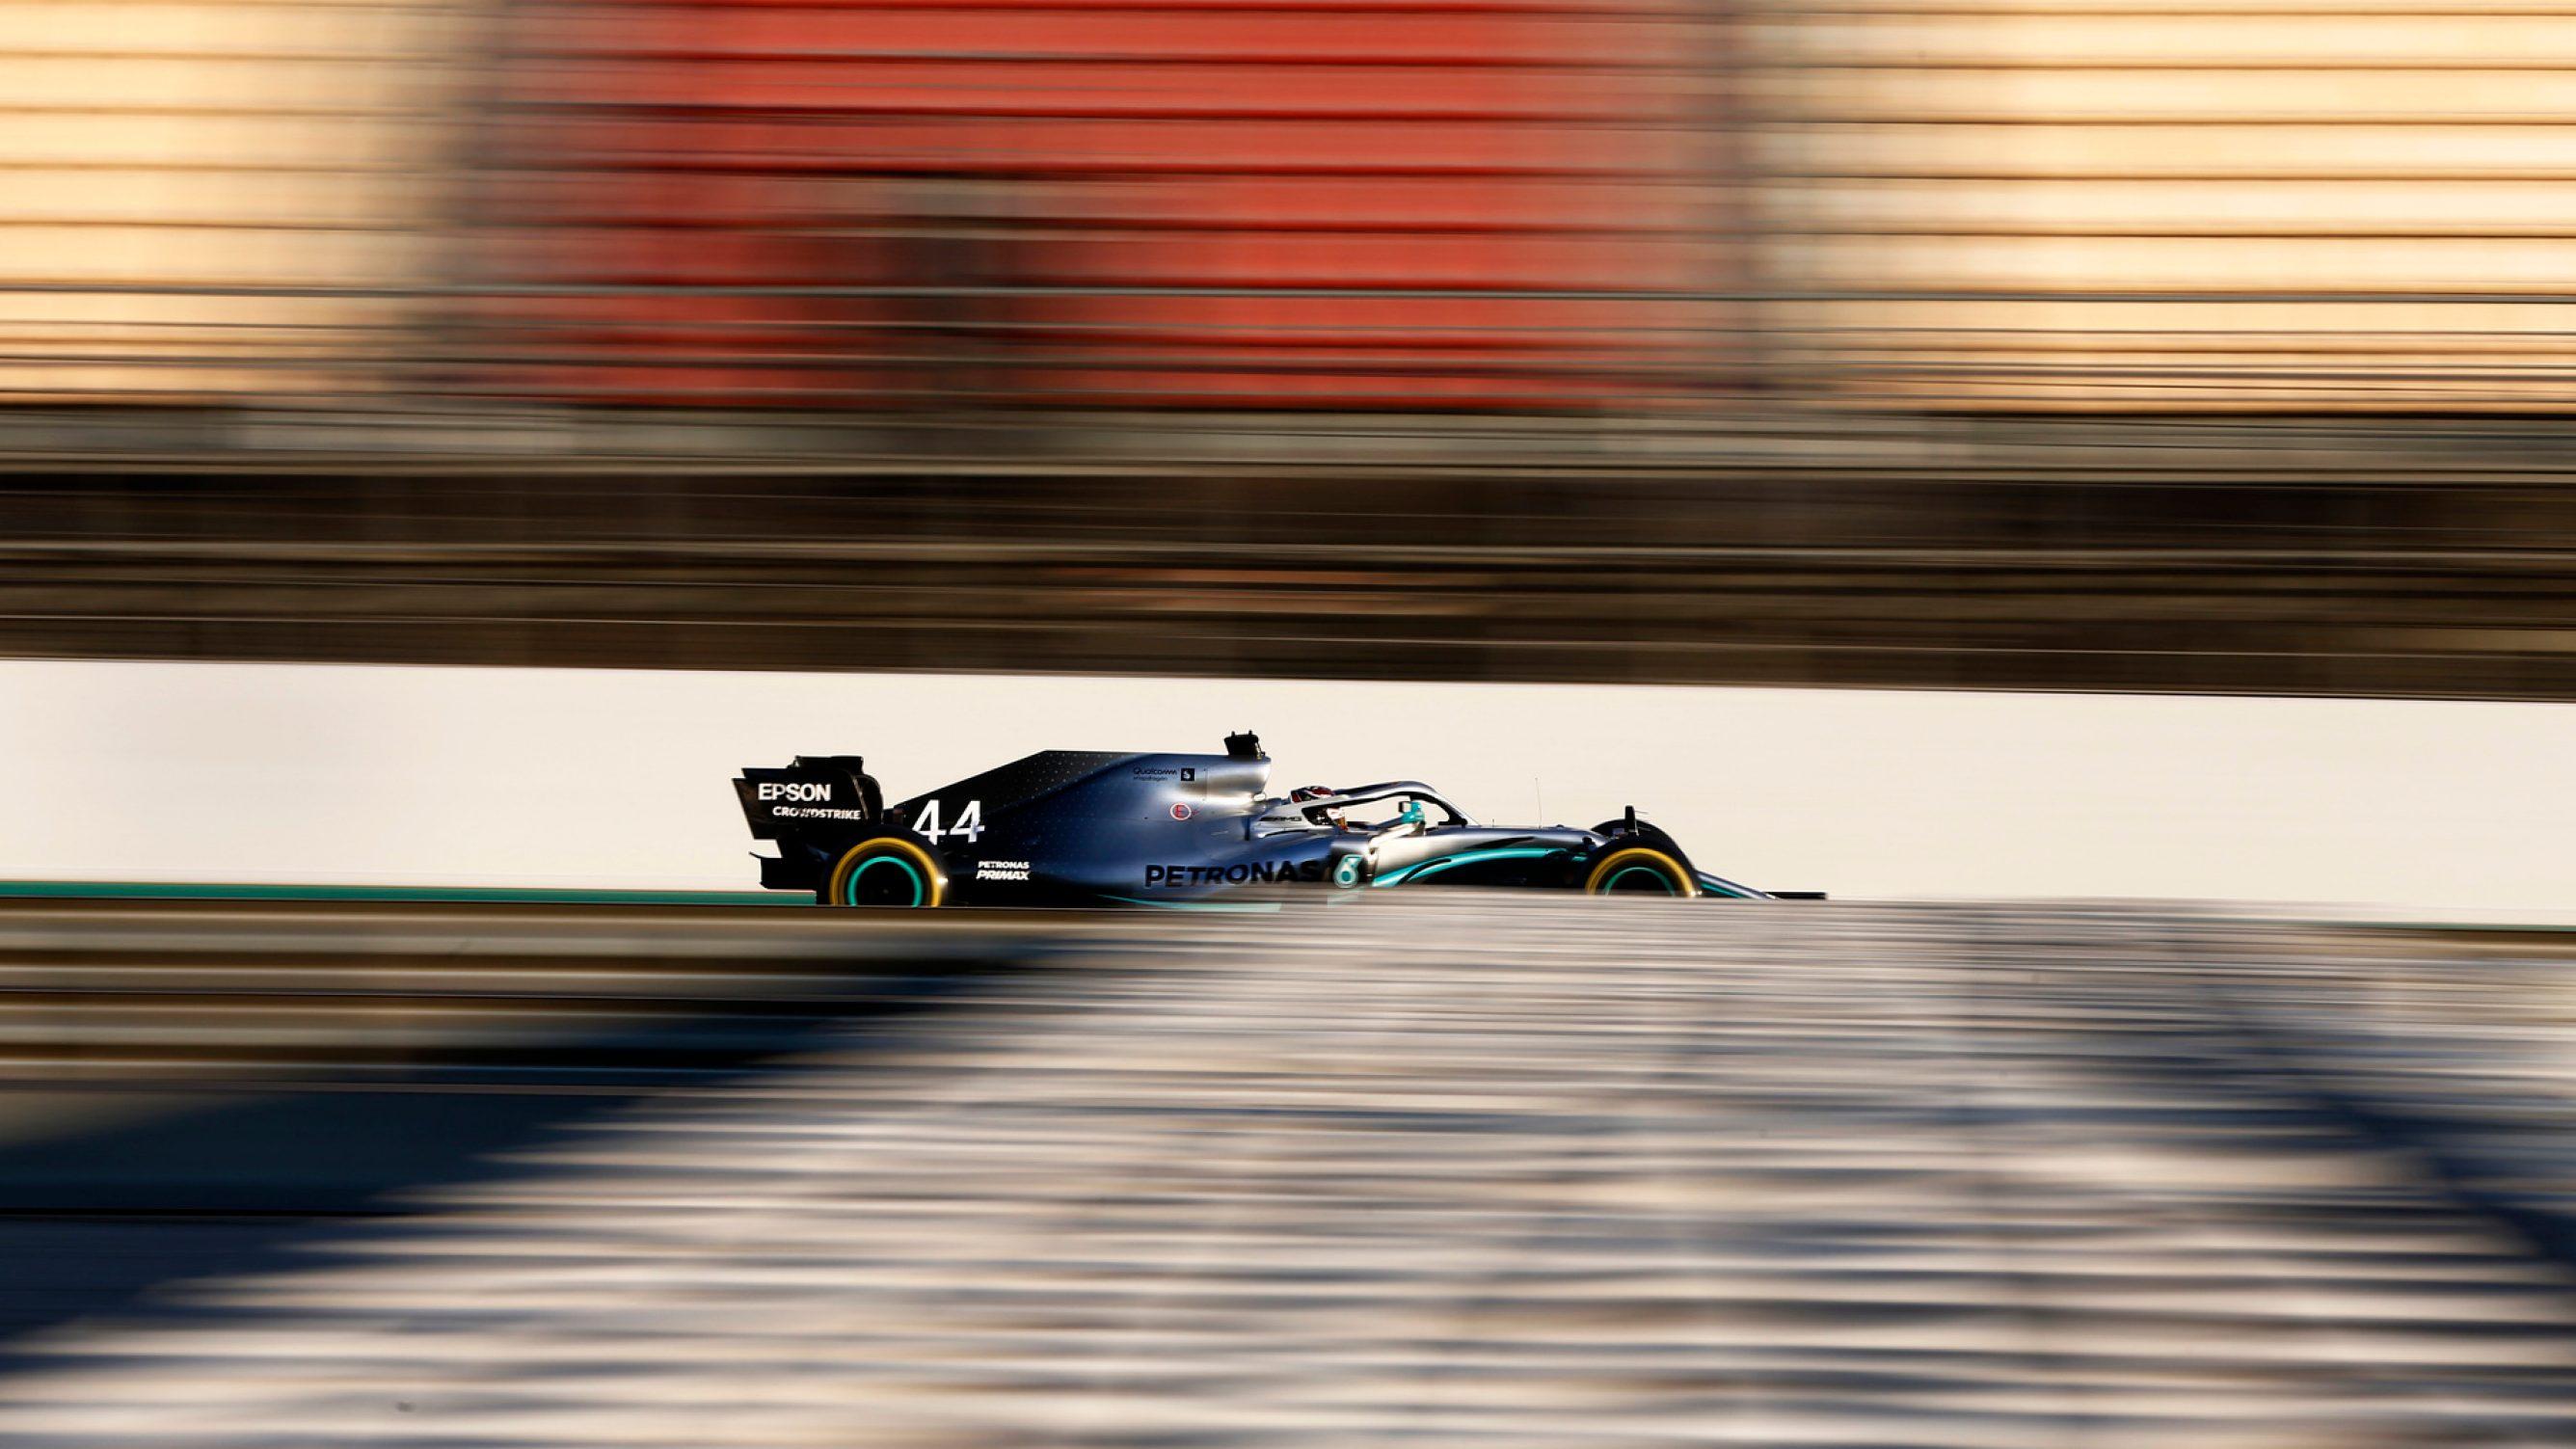 2019_F1_testing_2_day_2_0027